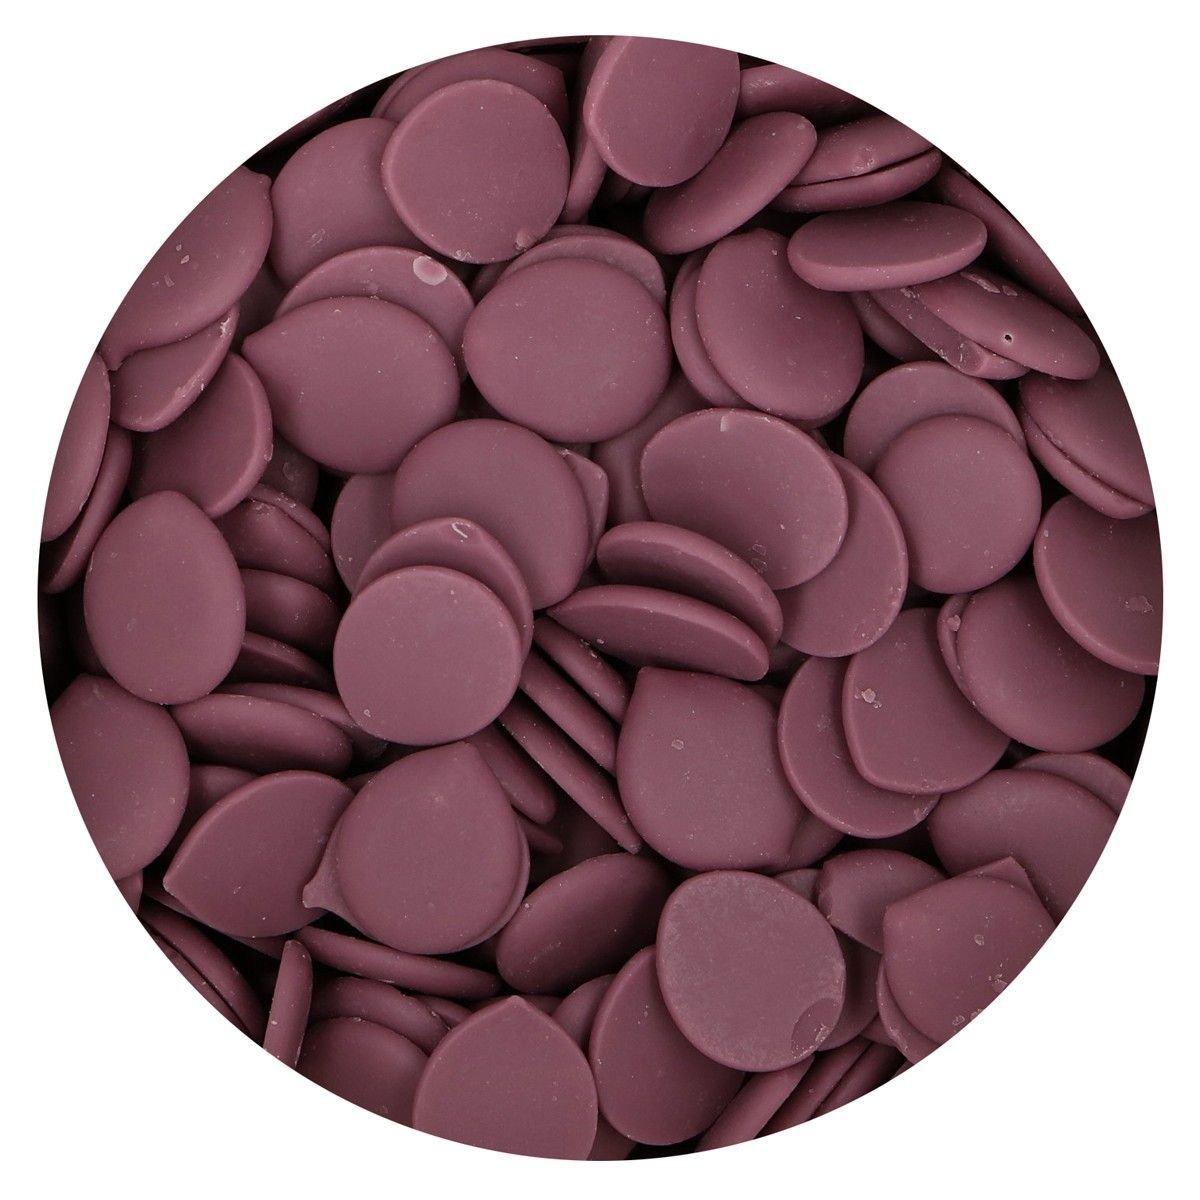 Funcakes - Deco Melts Purple (Natural Colouring) 250g - Κουβερτούρα Μωβ - 250γρ